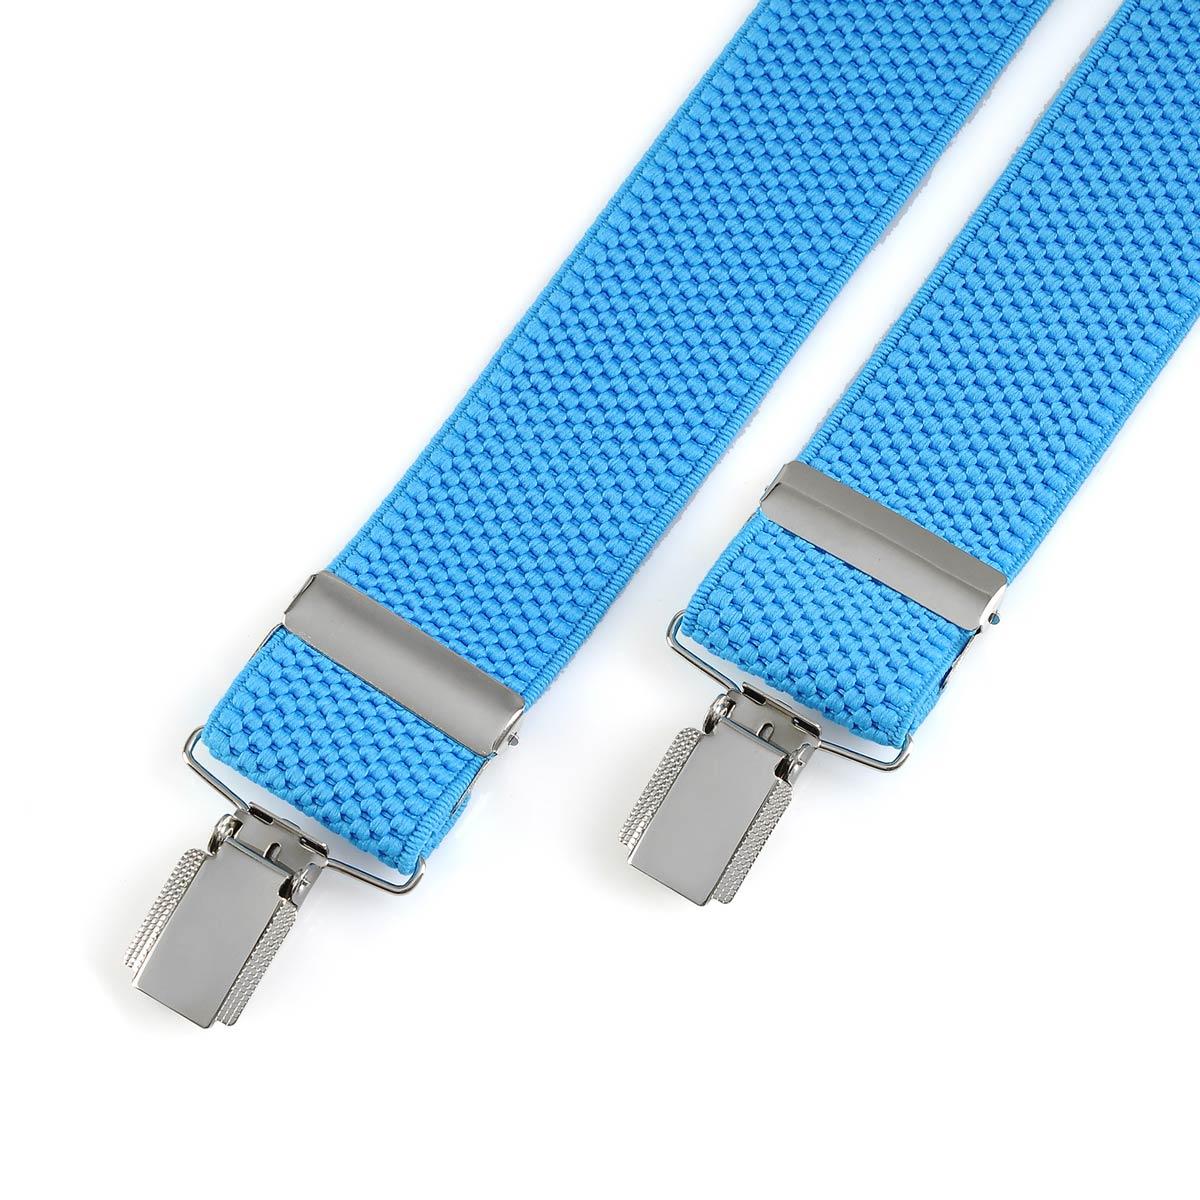 BT-00344_A12-1--_Bretelles-bleu-azur